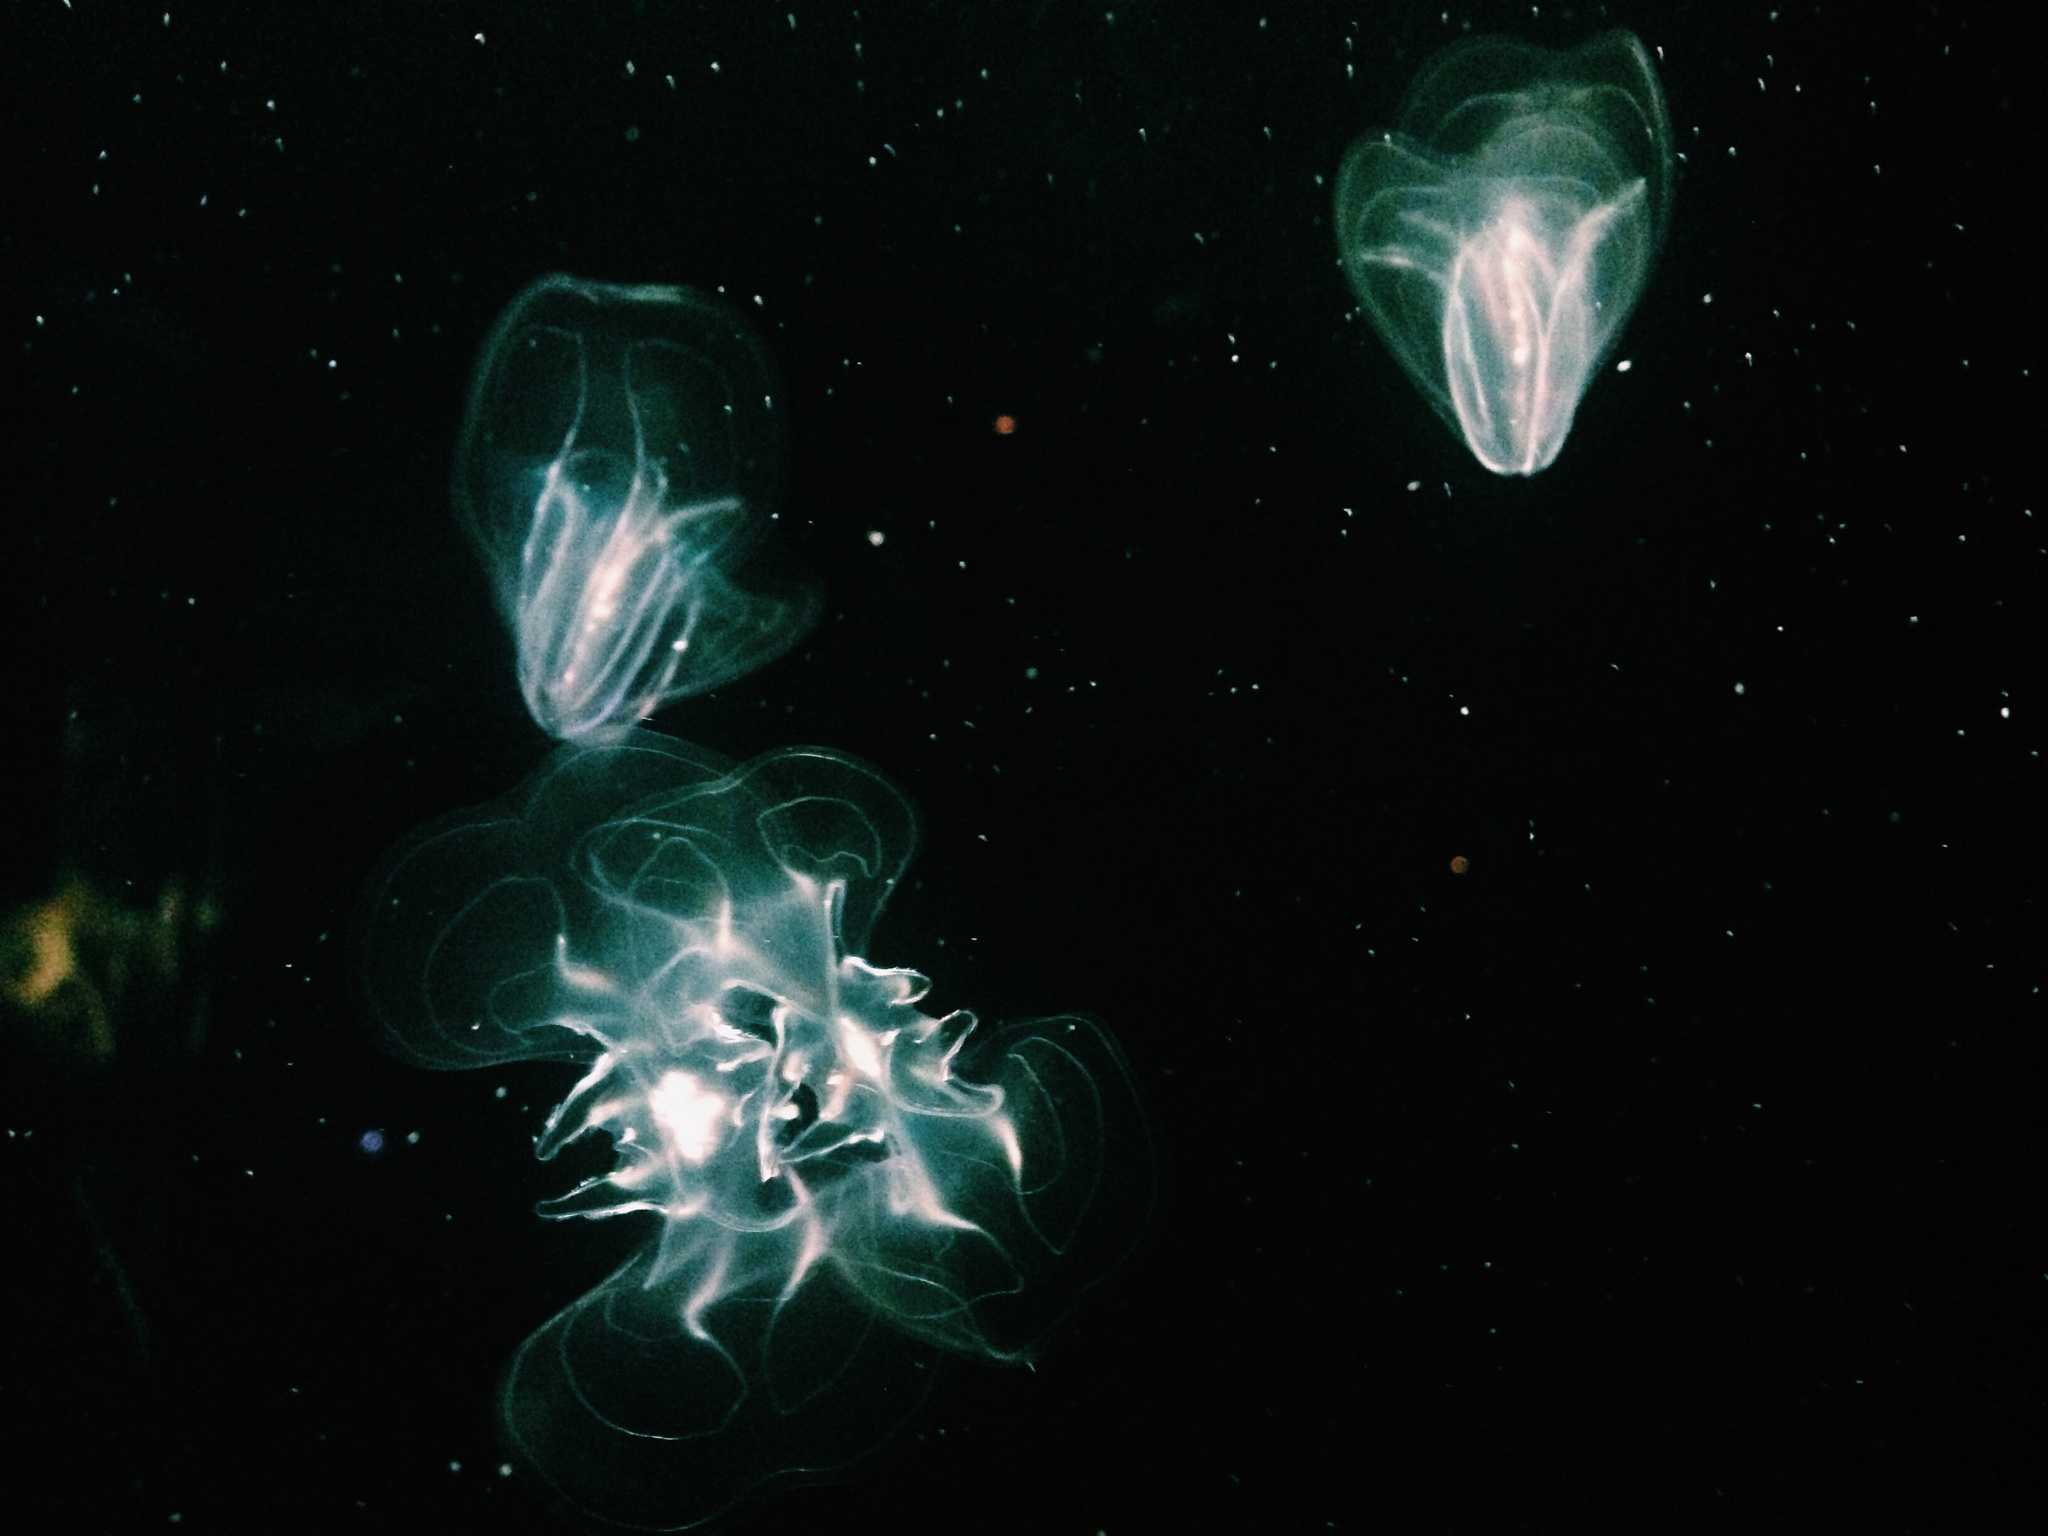 Universe by Anastsiia Kolomoiets